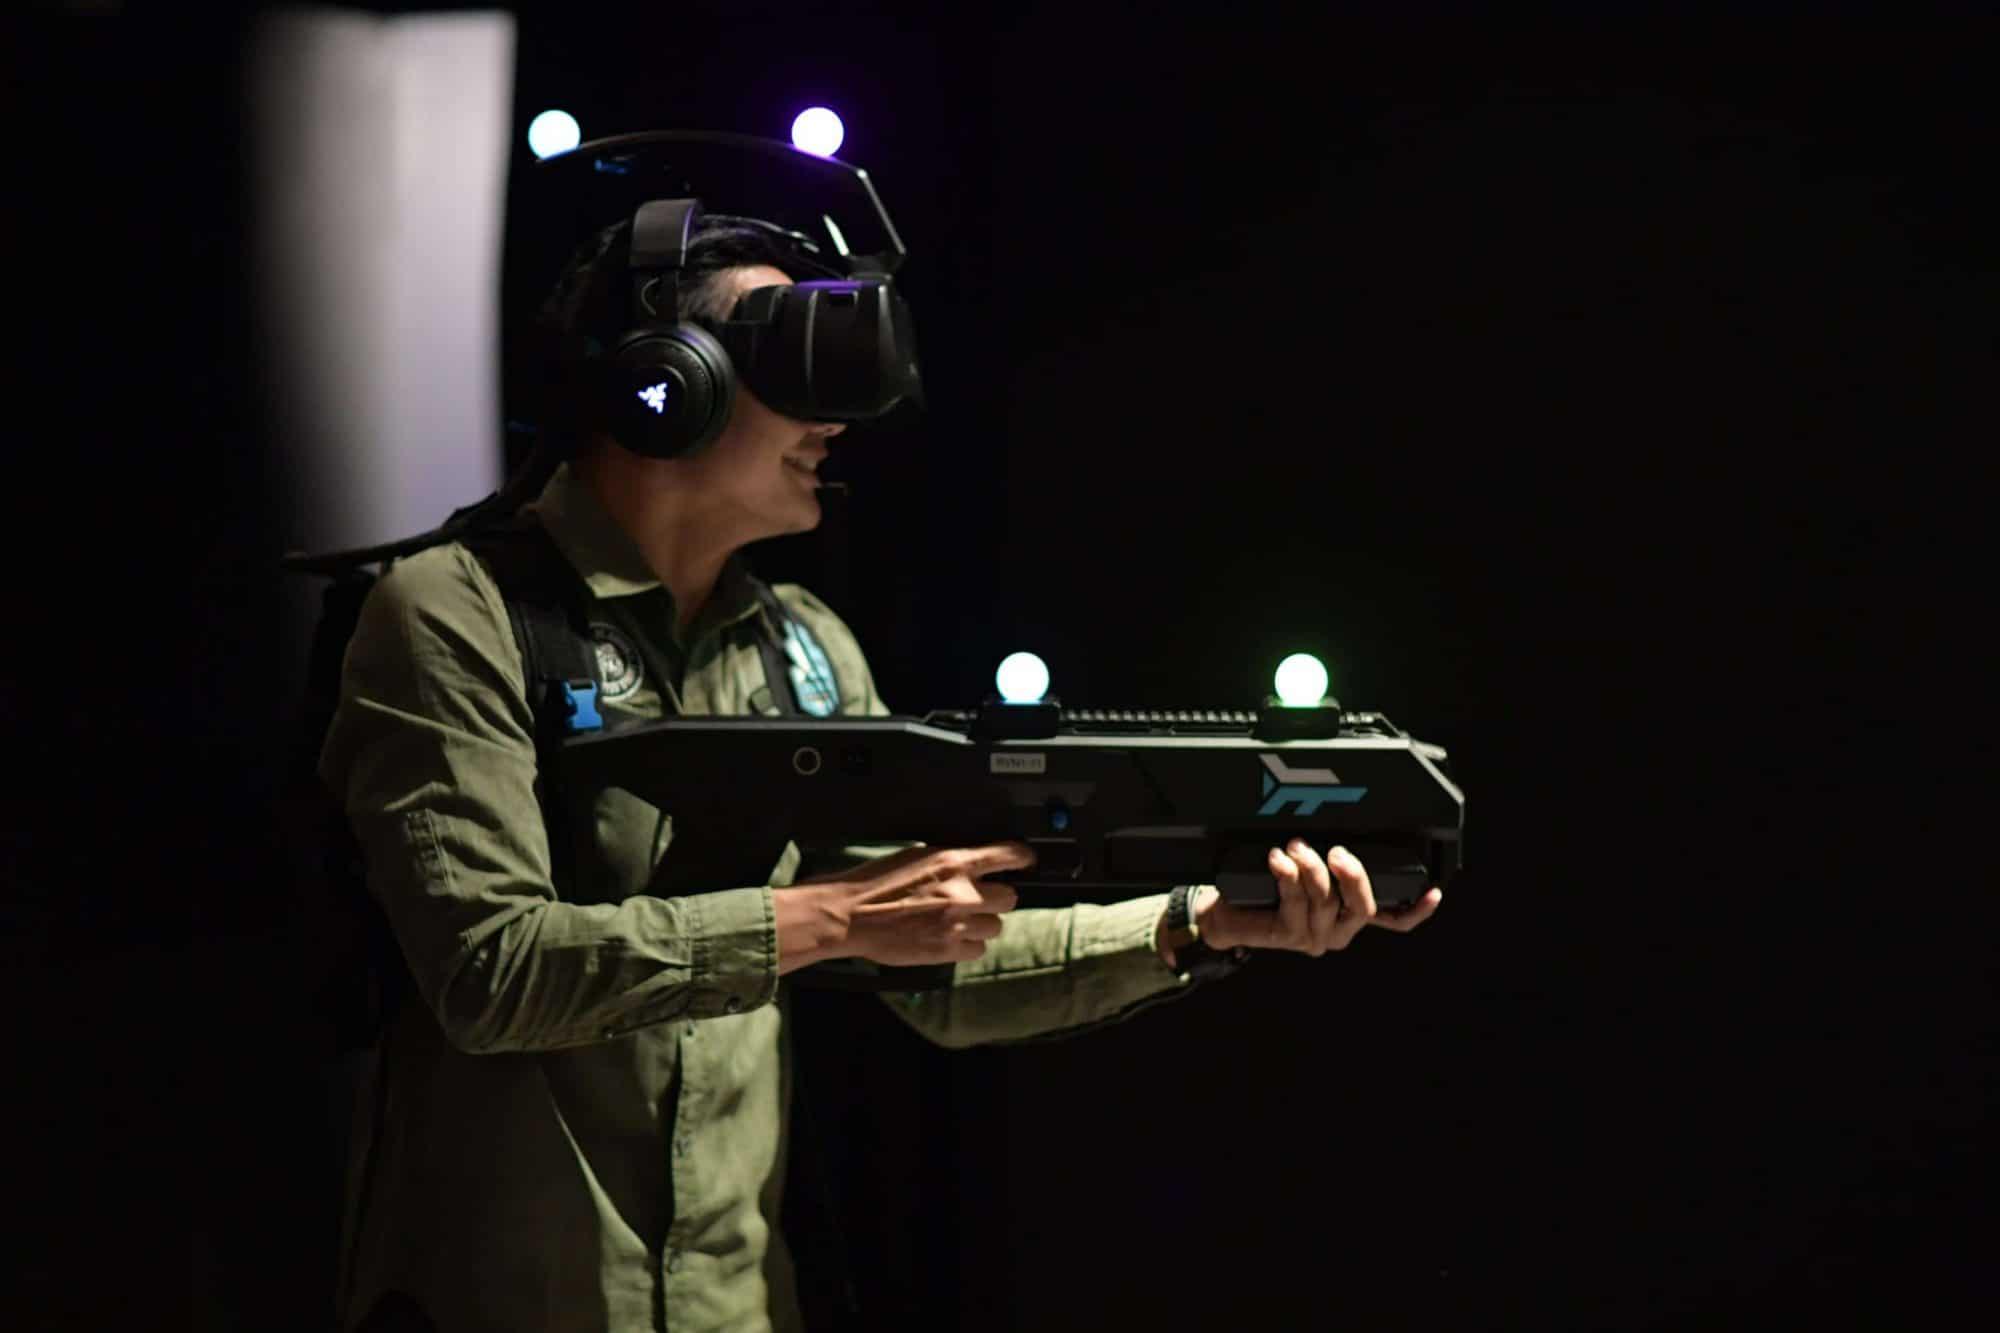 - ZERO LATENCY สนามแข่งขันเกม VR ในระบบไร้สาย เปิดตัวในไทยแล้ว ณ โรงแรมโนโวเทล สยามสแควร์